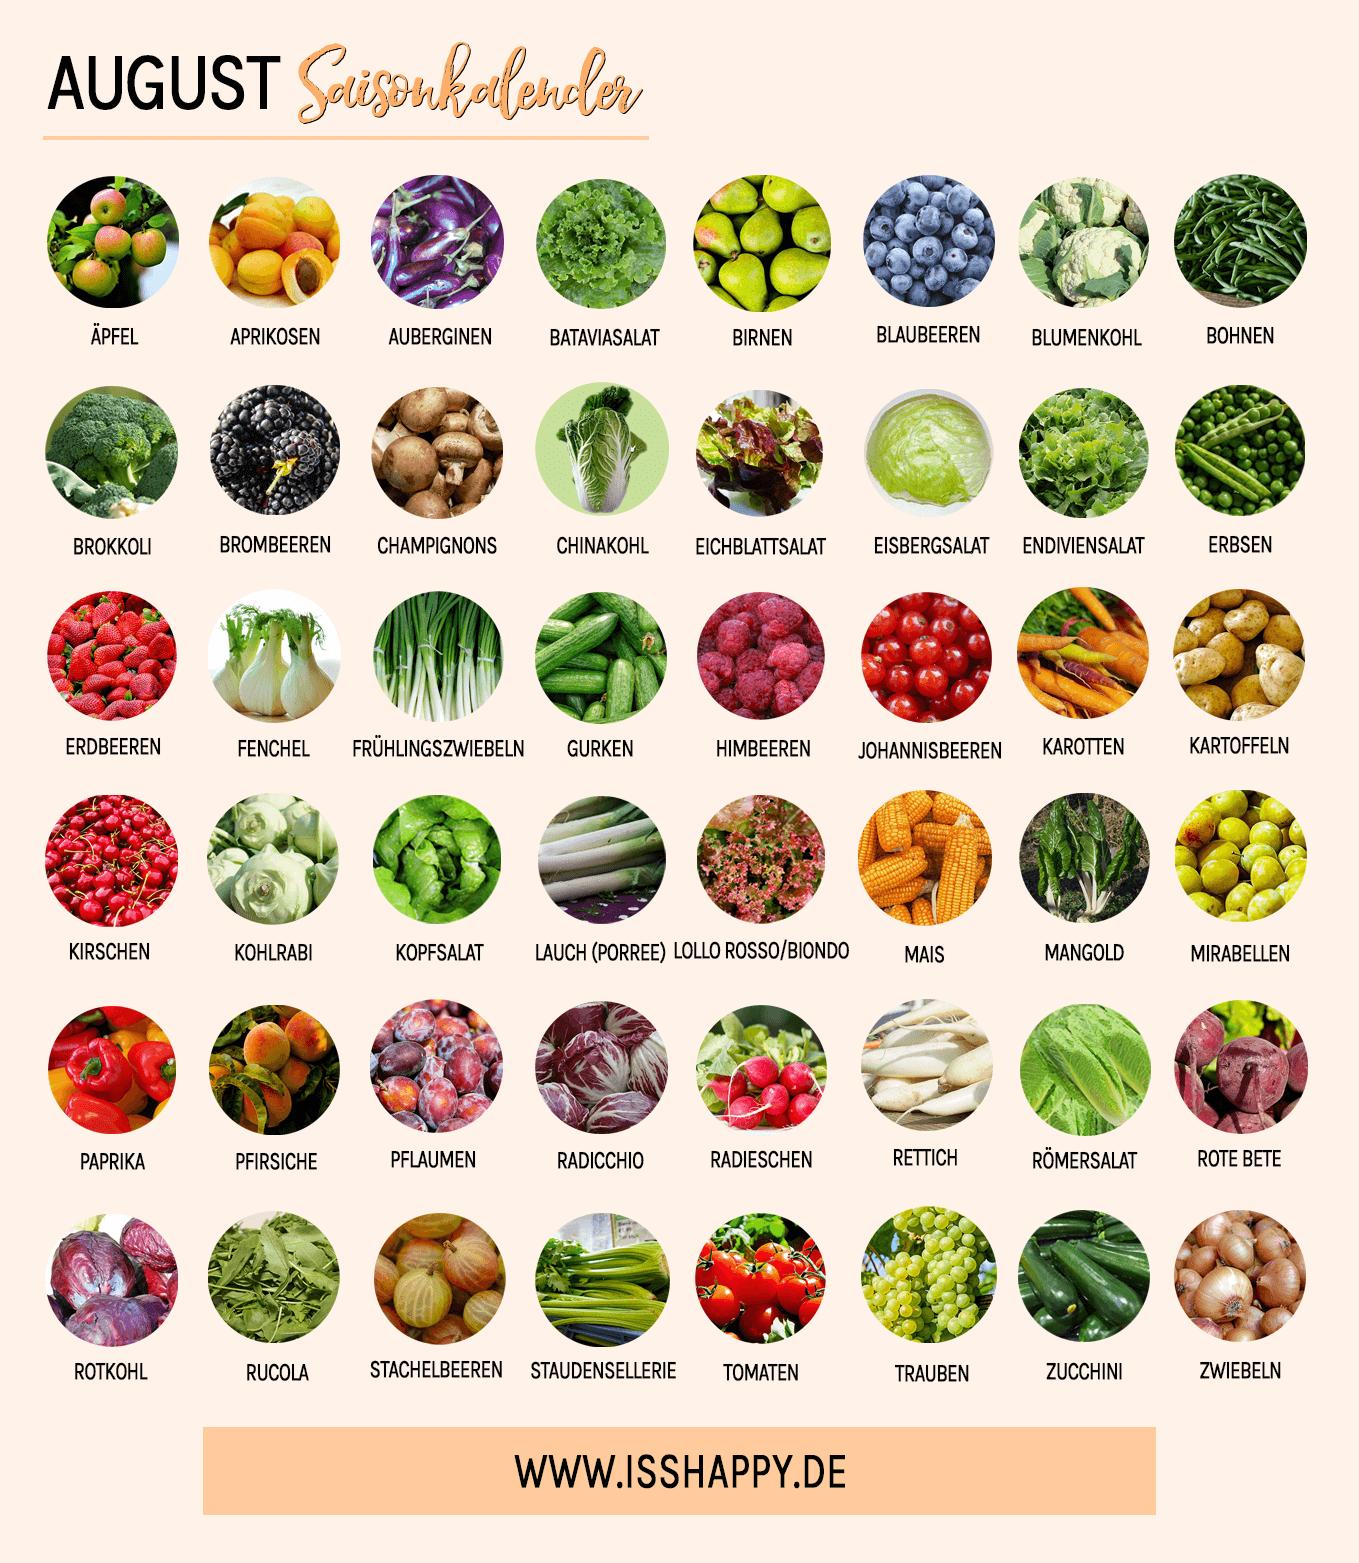 Saisonkalender August + 10 passende vegane Rezeptideen